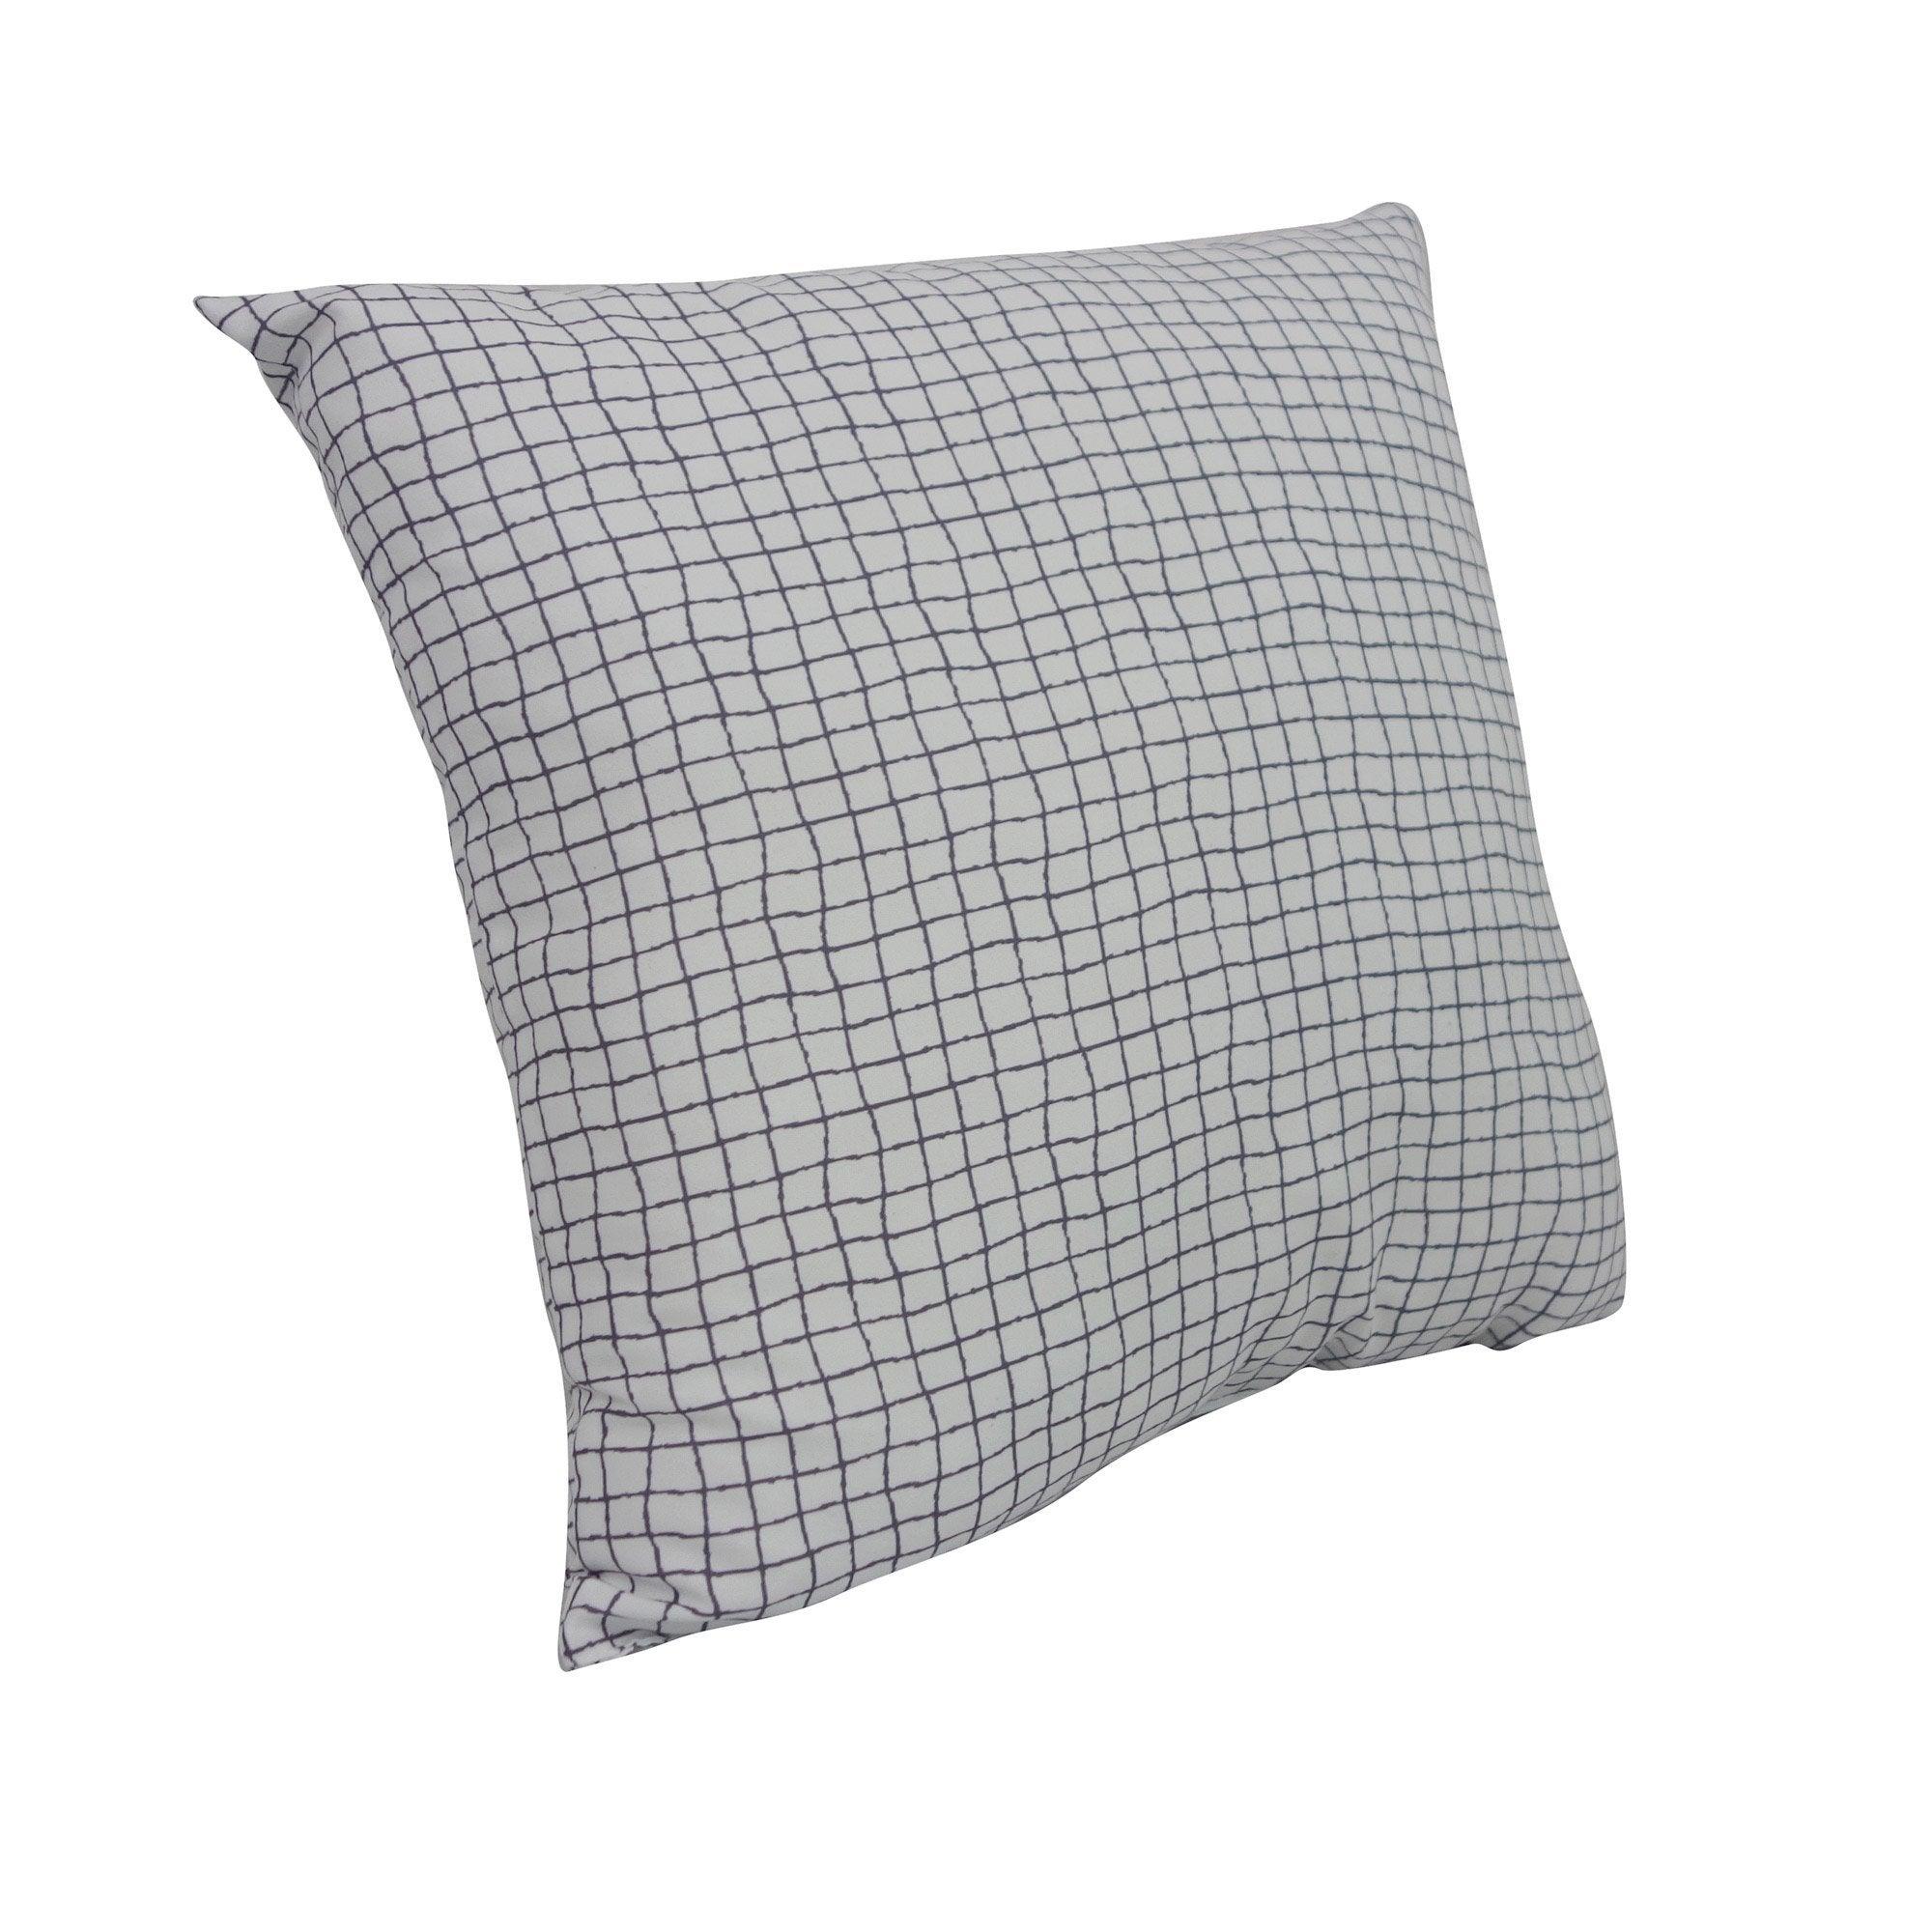 Coussin Romy INSPIRE, blanc/gris l.35xH.35 cm